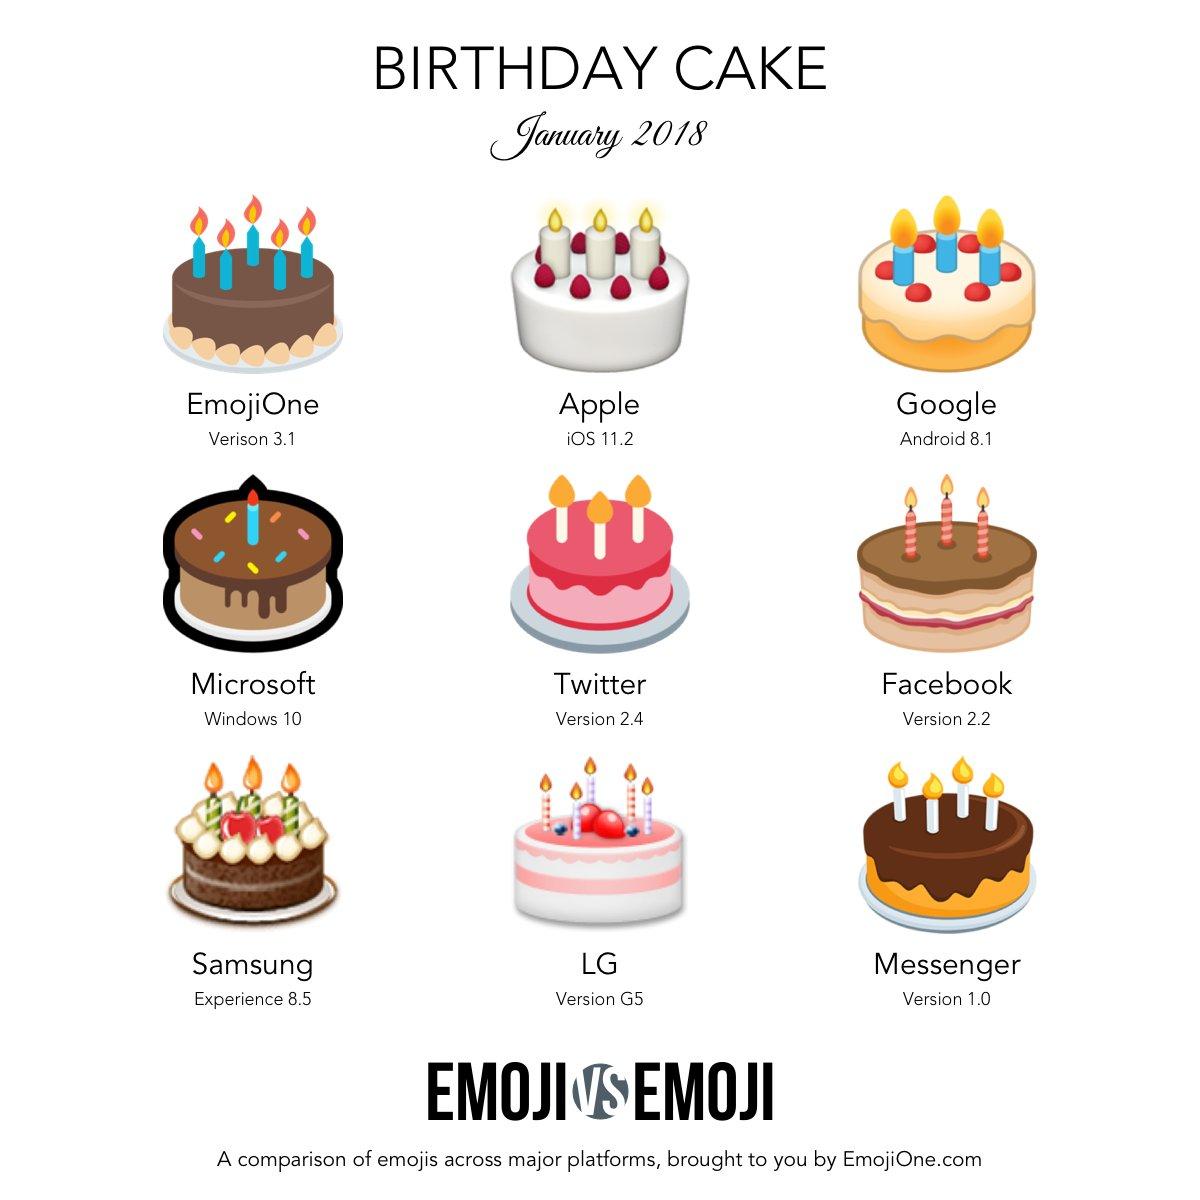 Birthday Cake Emoji Emojione On Twitter Apparently The Consensus For Preferred